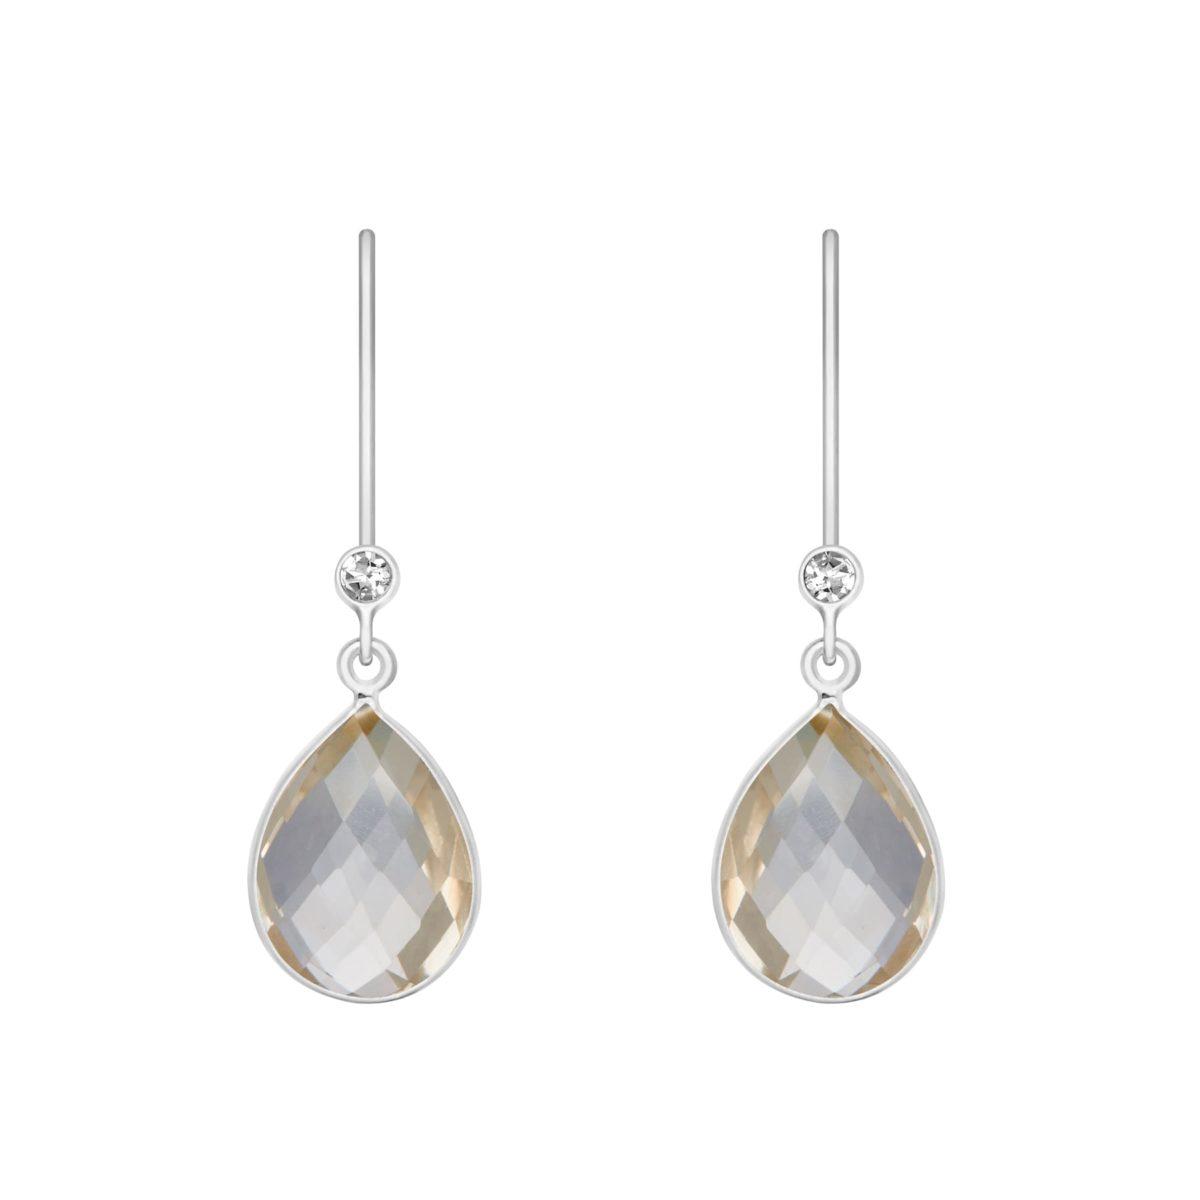 Shakara Jewellery, Droplet-collection-Clear-rock-crystal dangle earring.